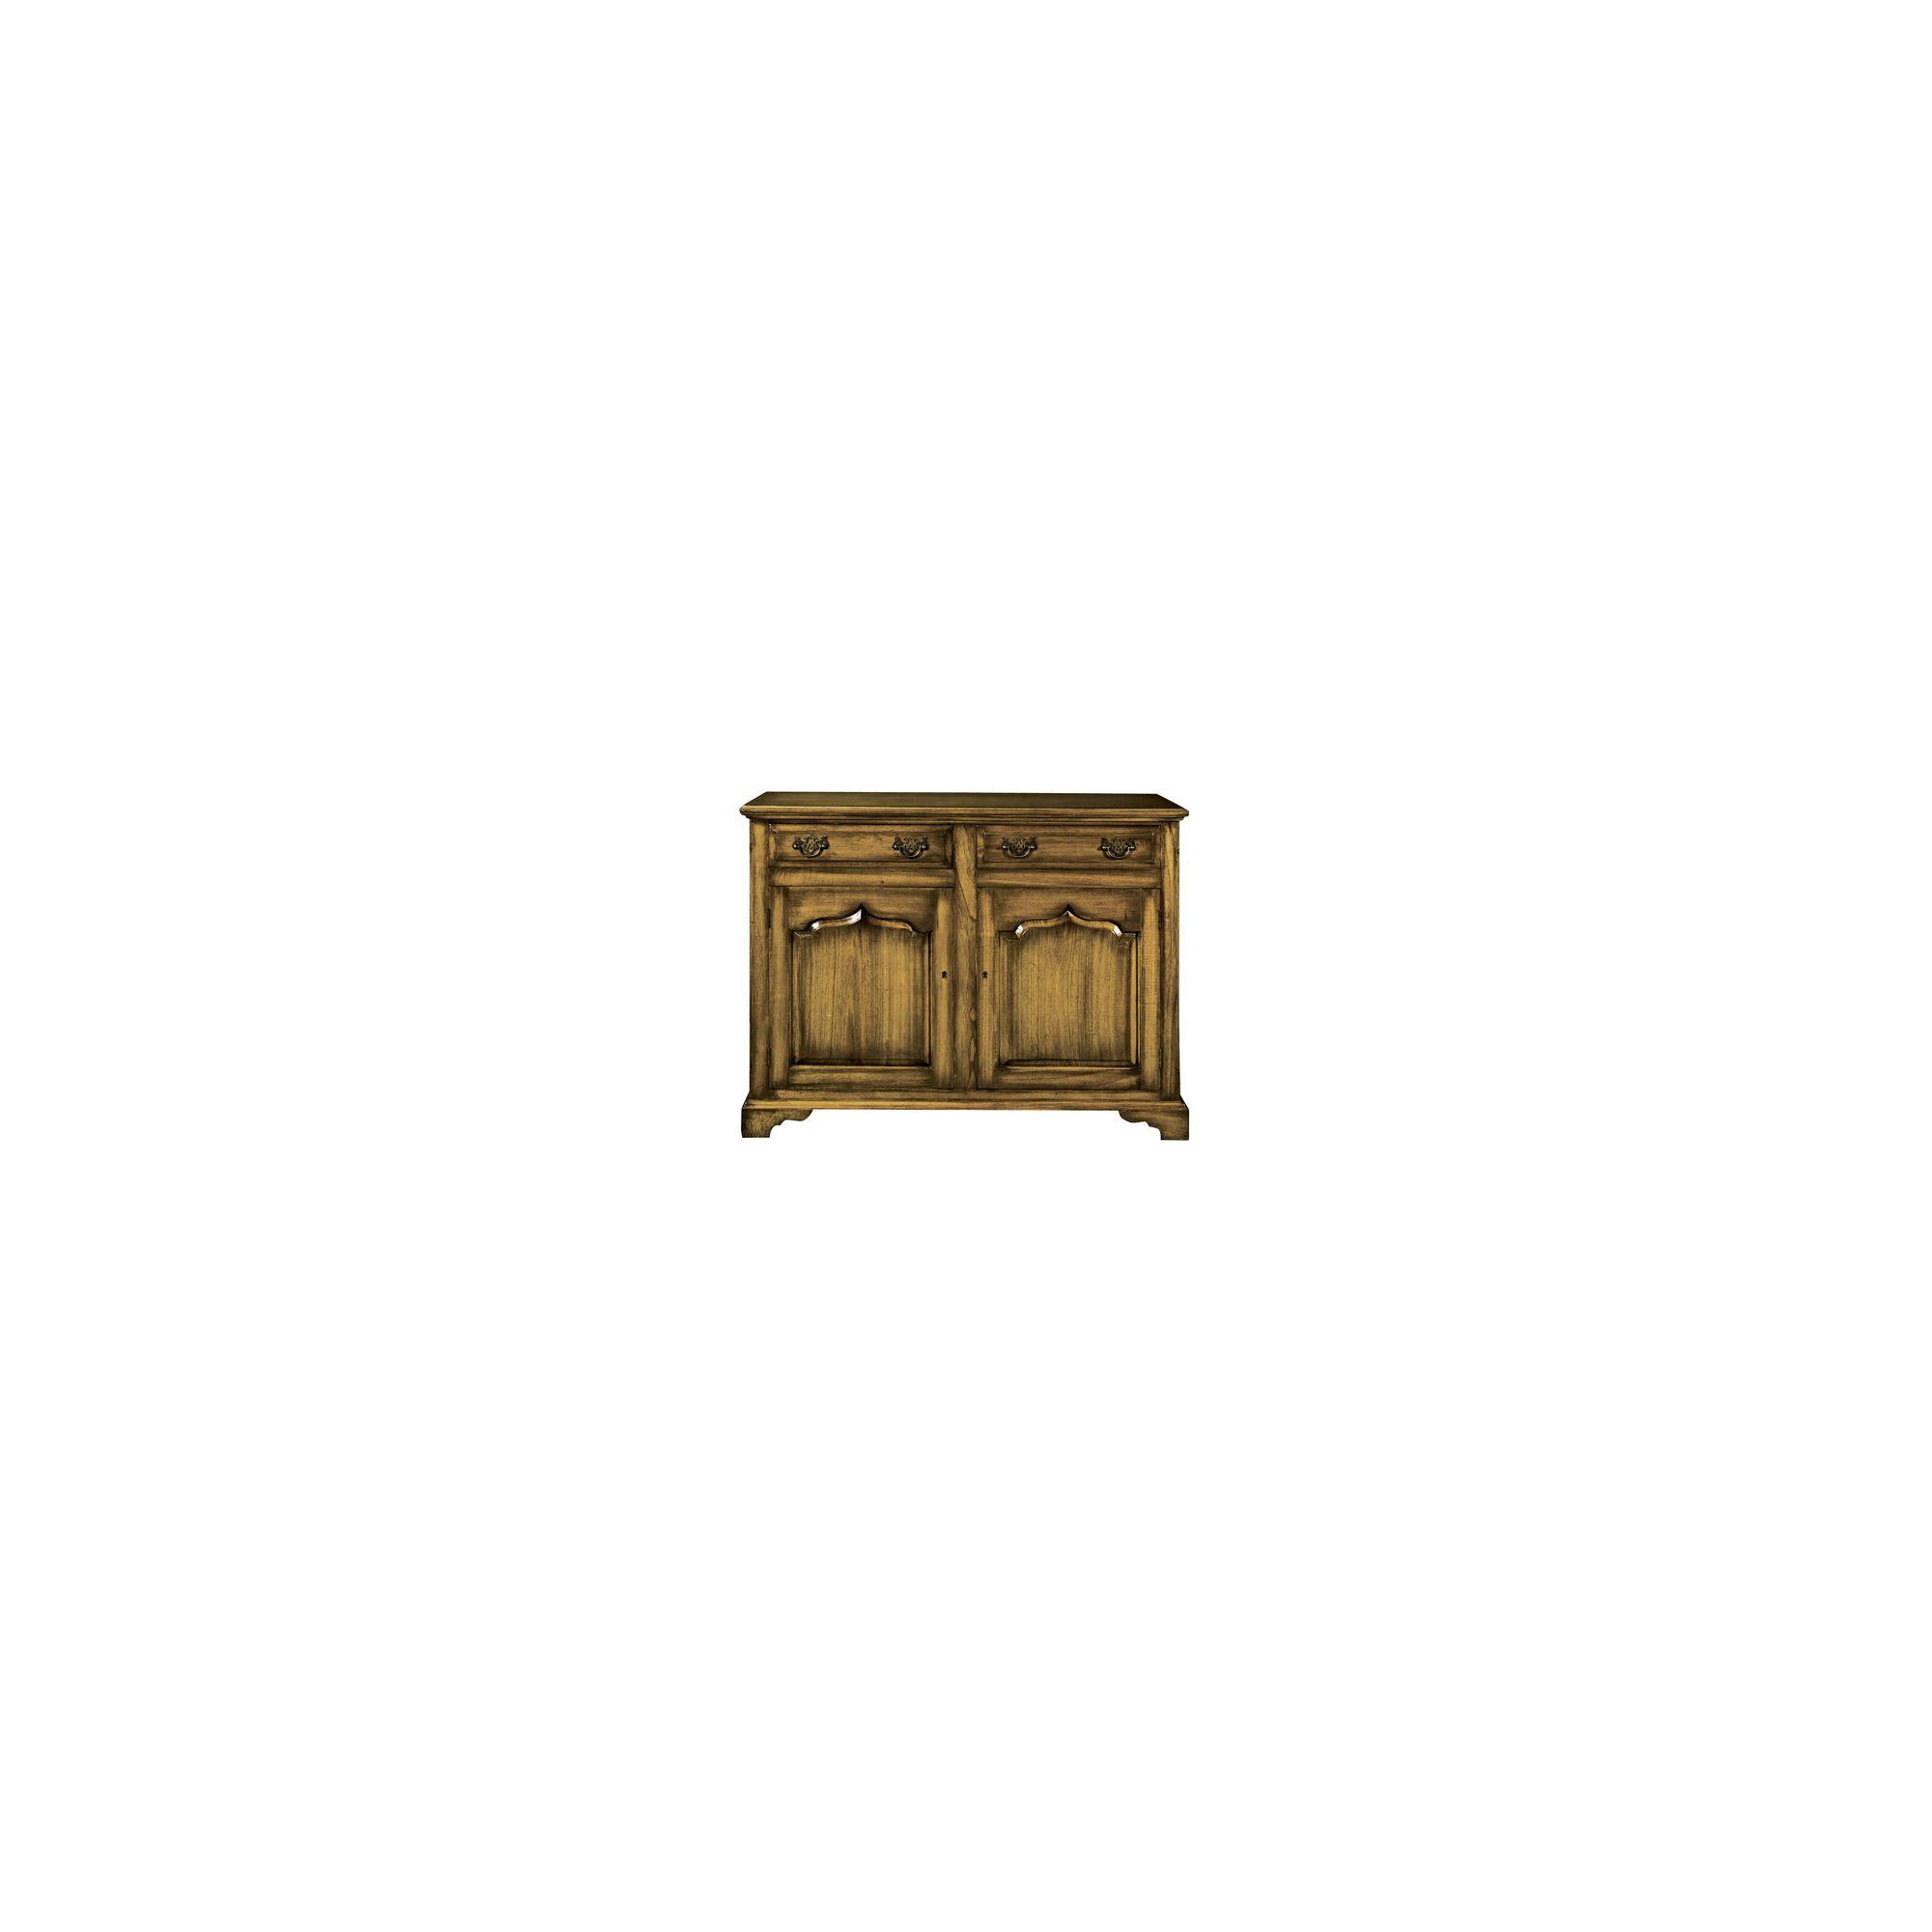 Alterton Furniture Beningbrough Sideboard at Tesco Direct